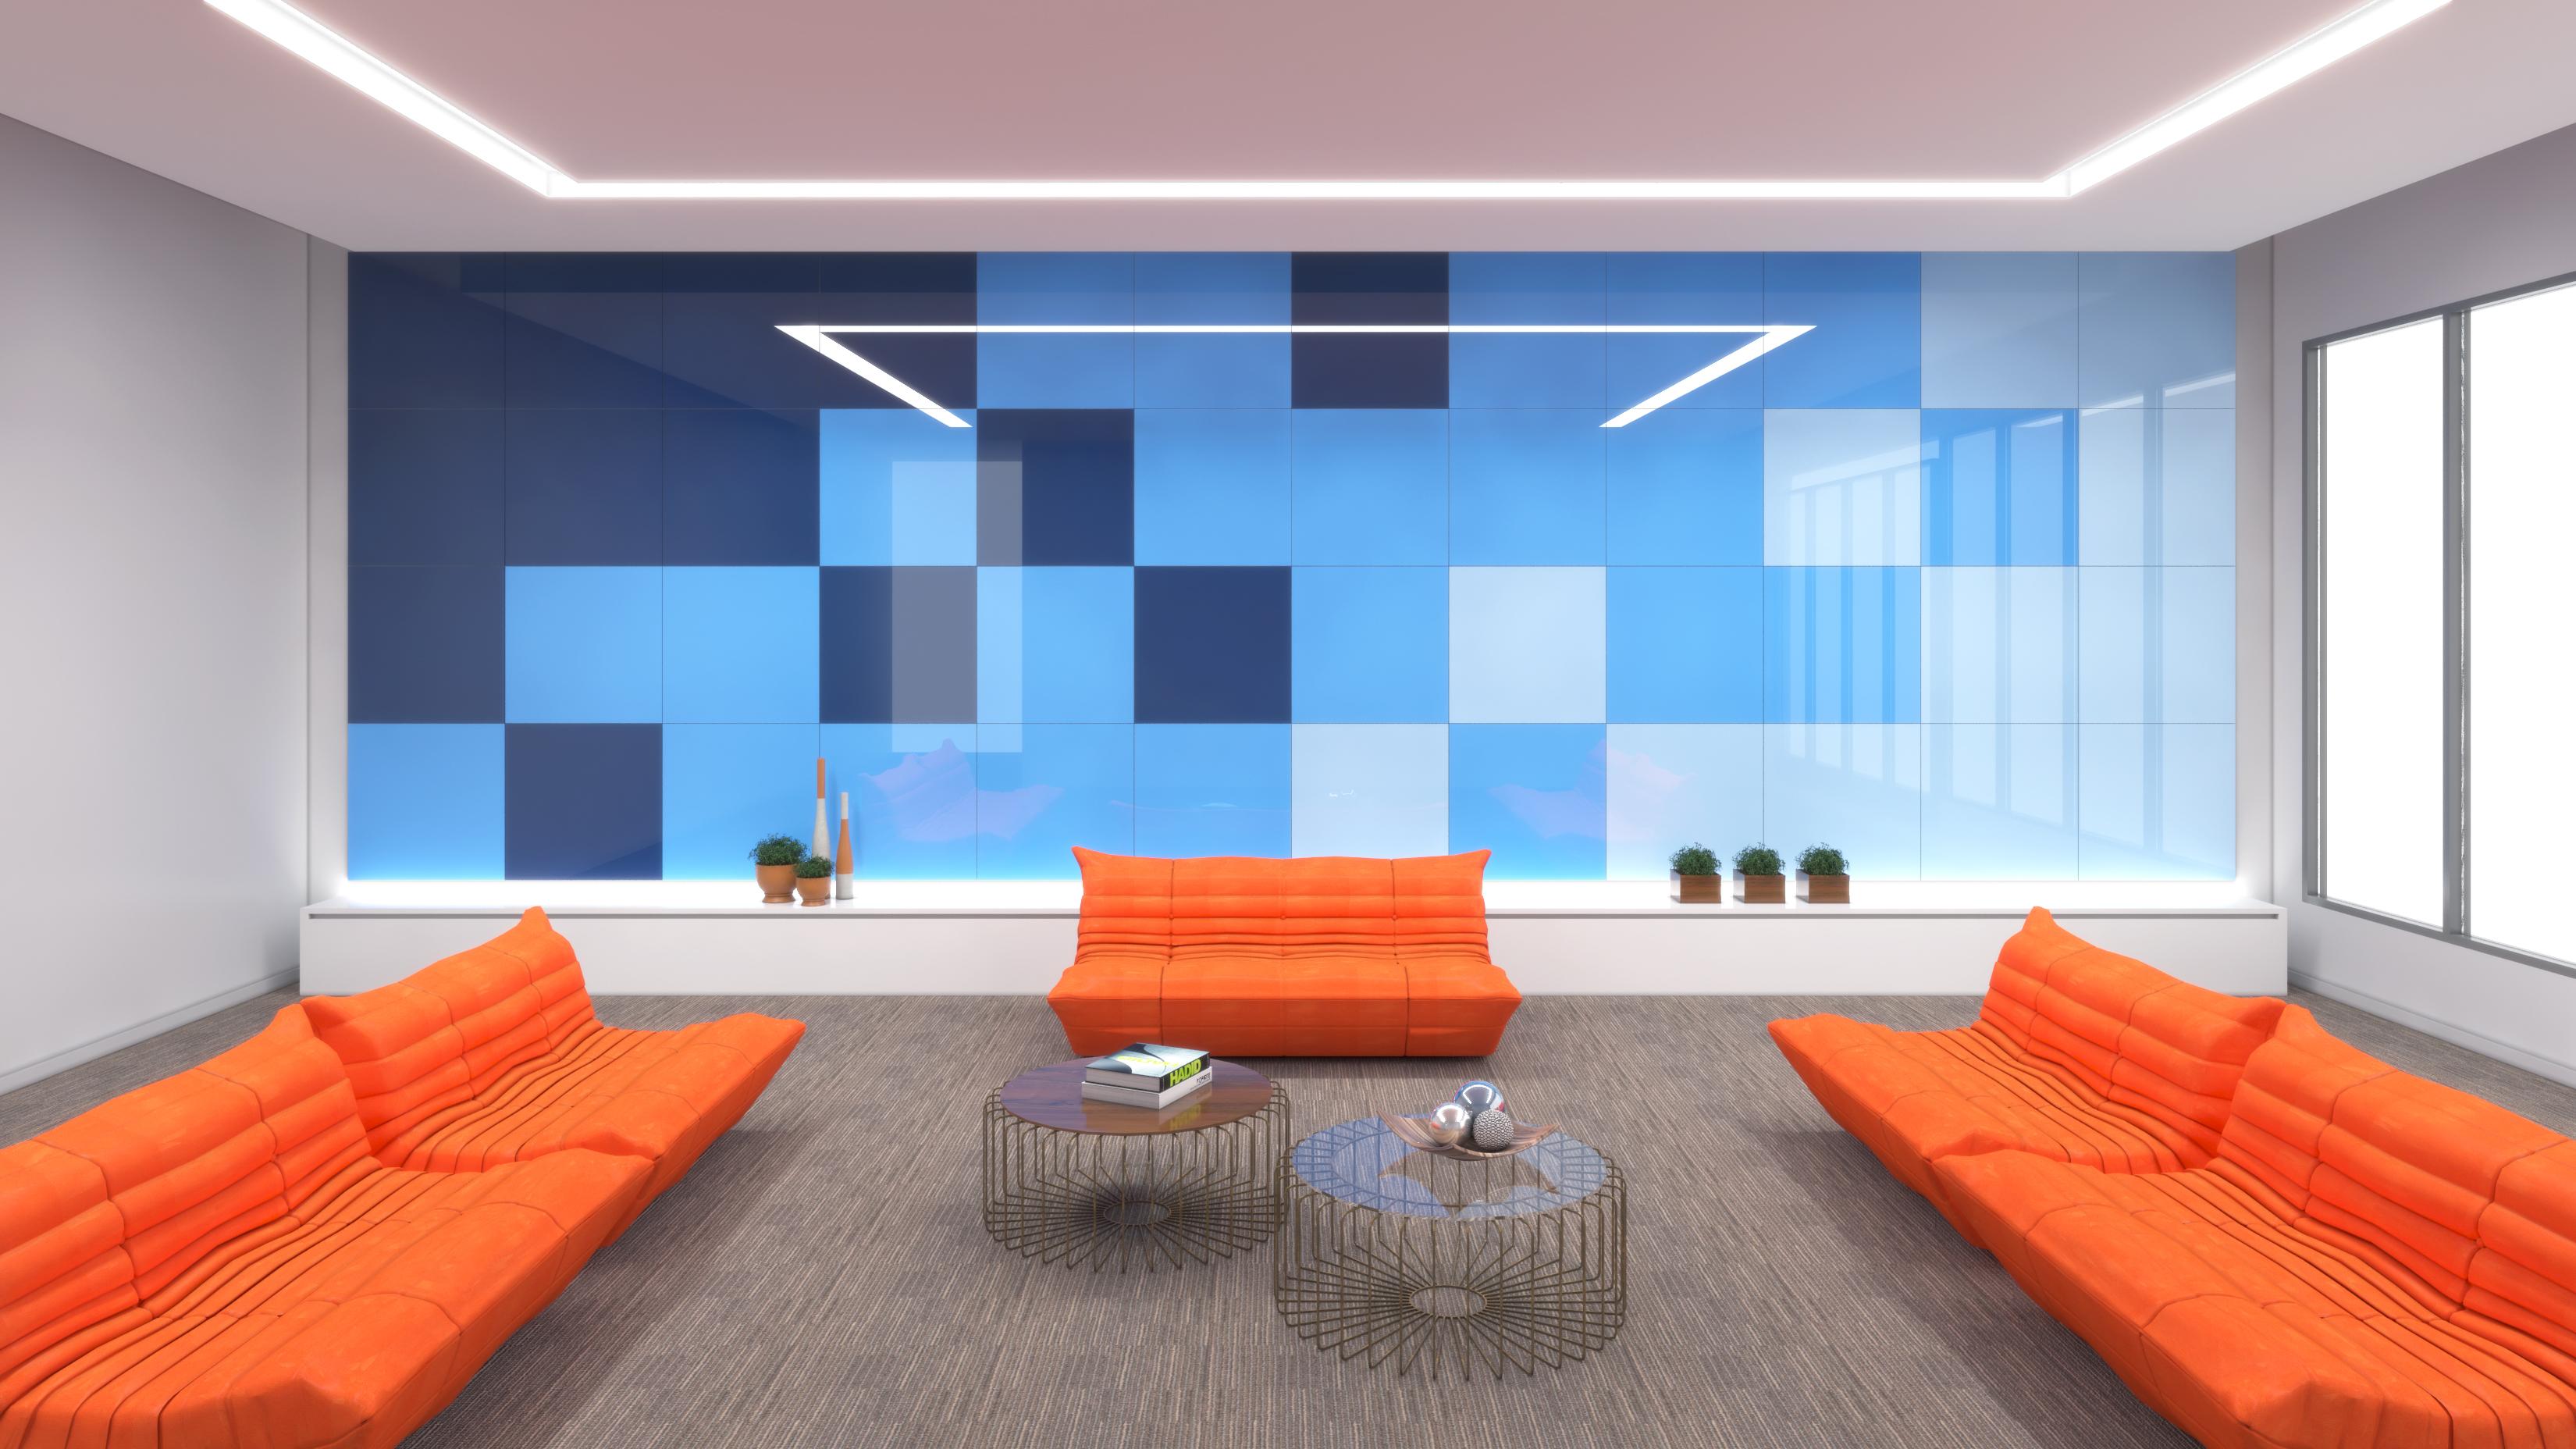 Lobby Hotel - Multpainel. 3D